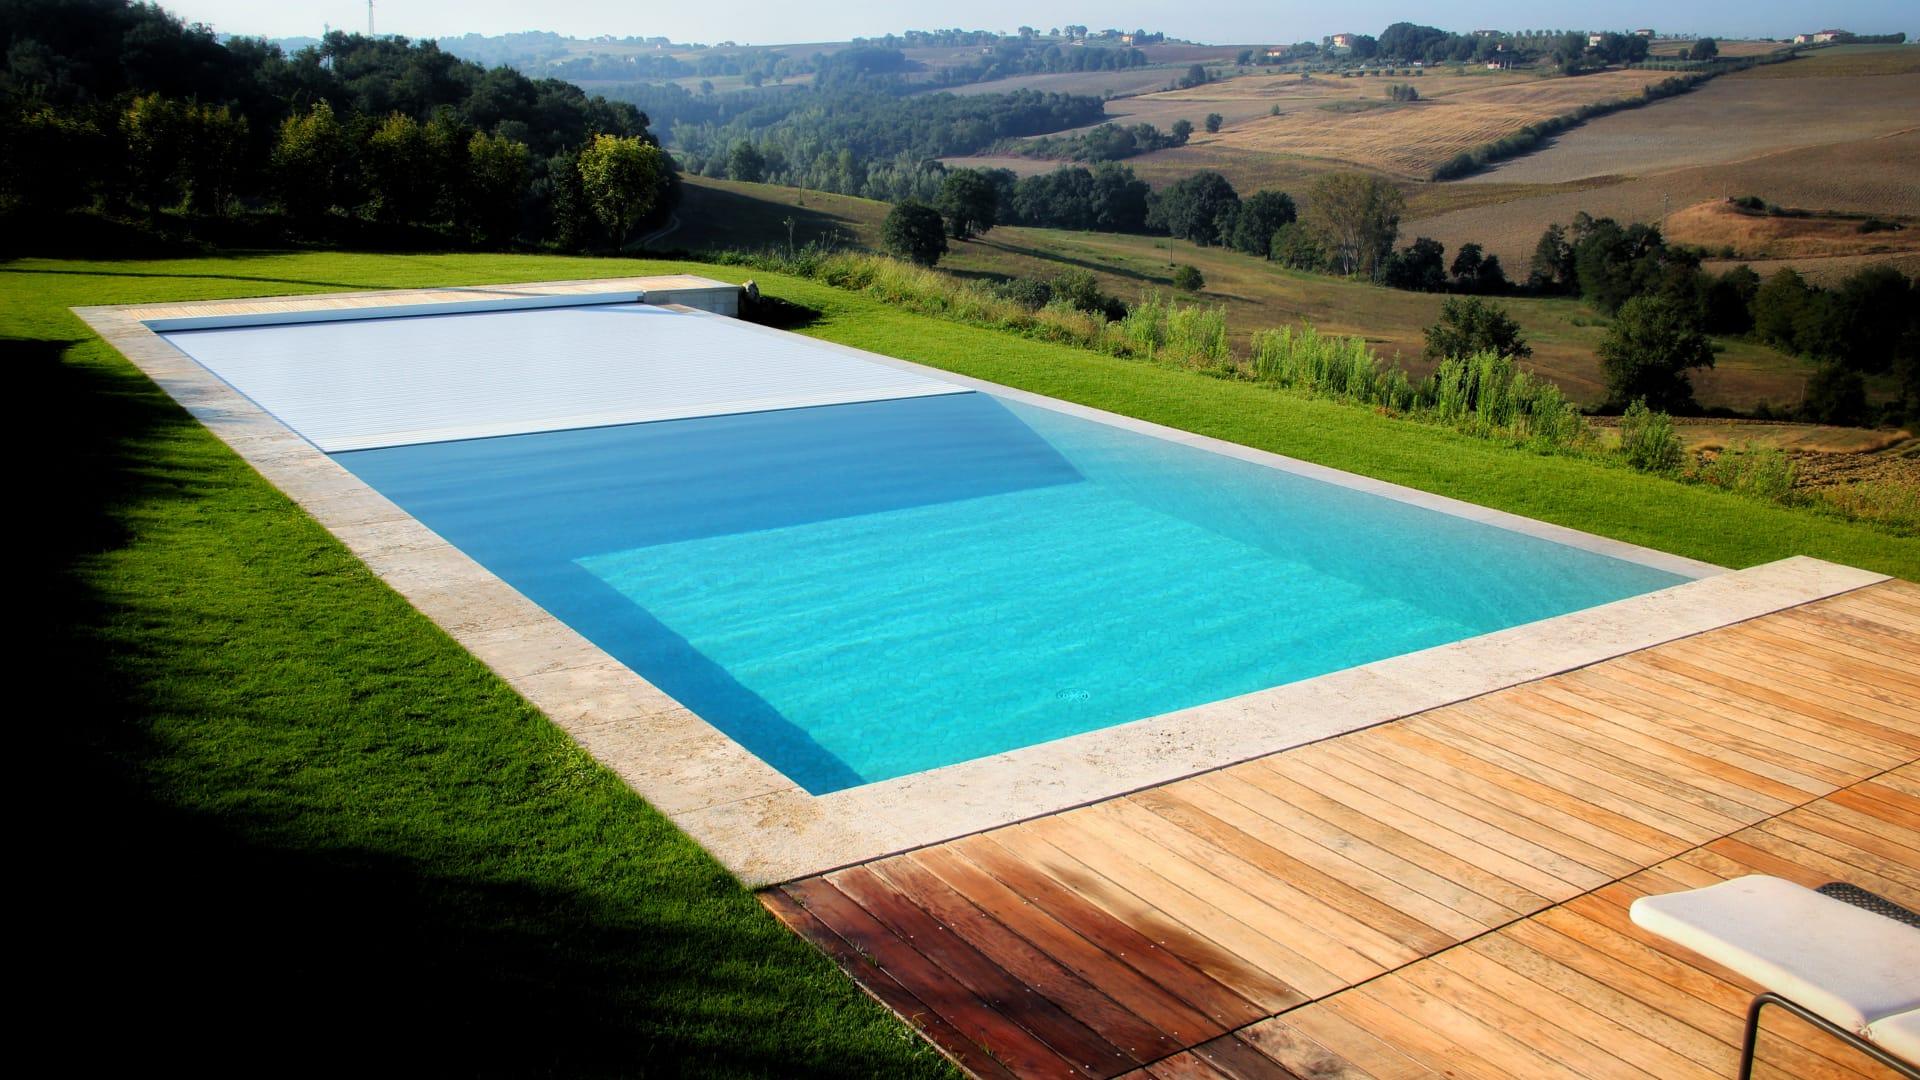 Tensostrutture e coperture piscina e padel Padova | Favaretti Group